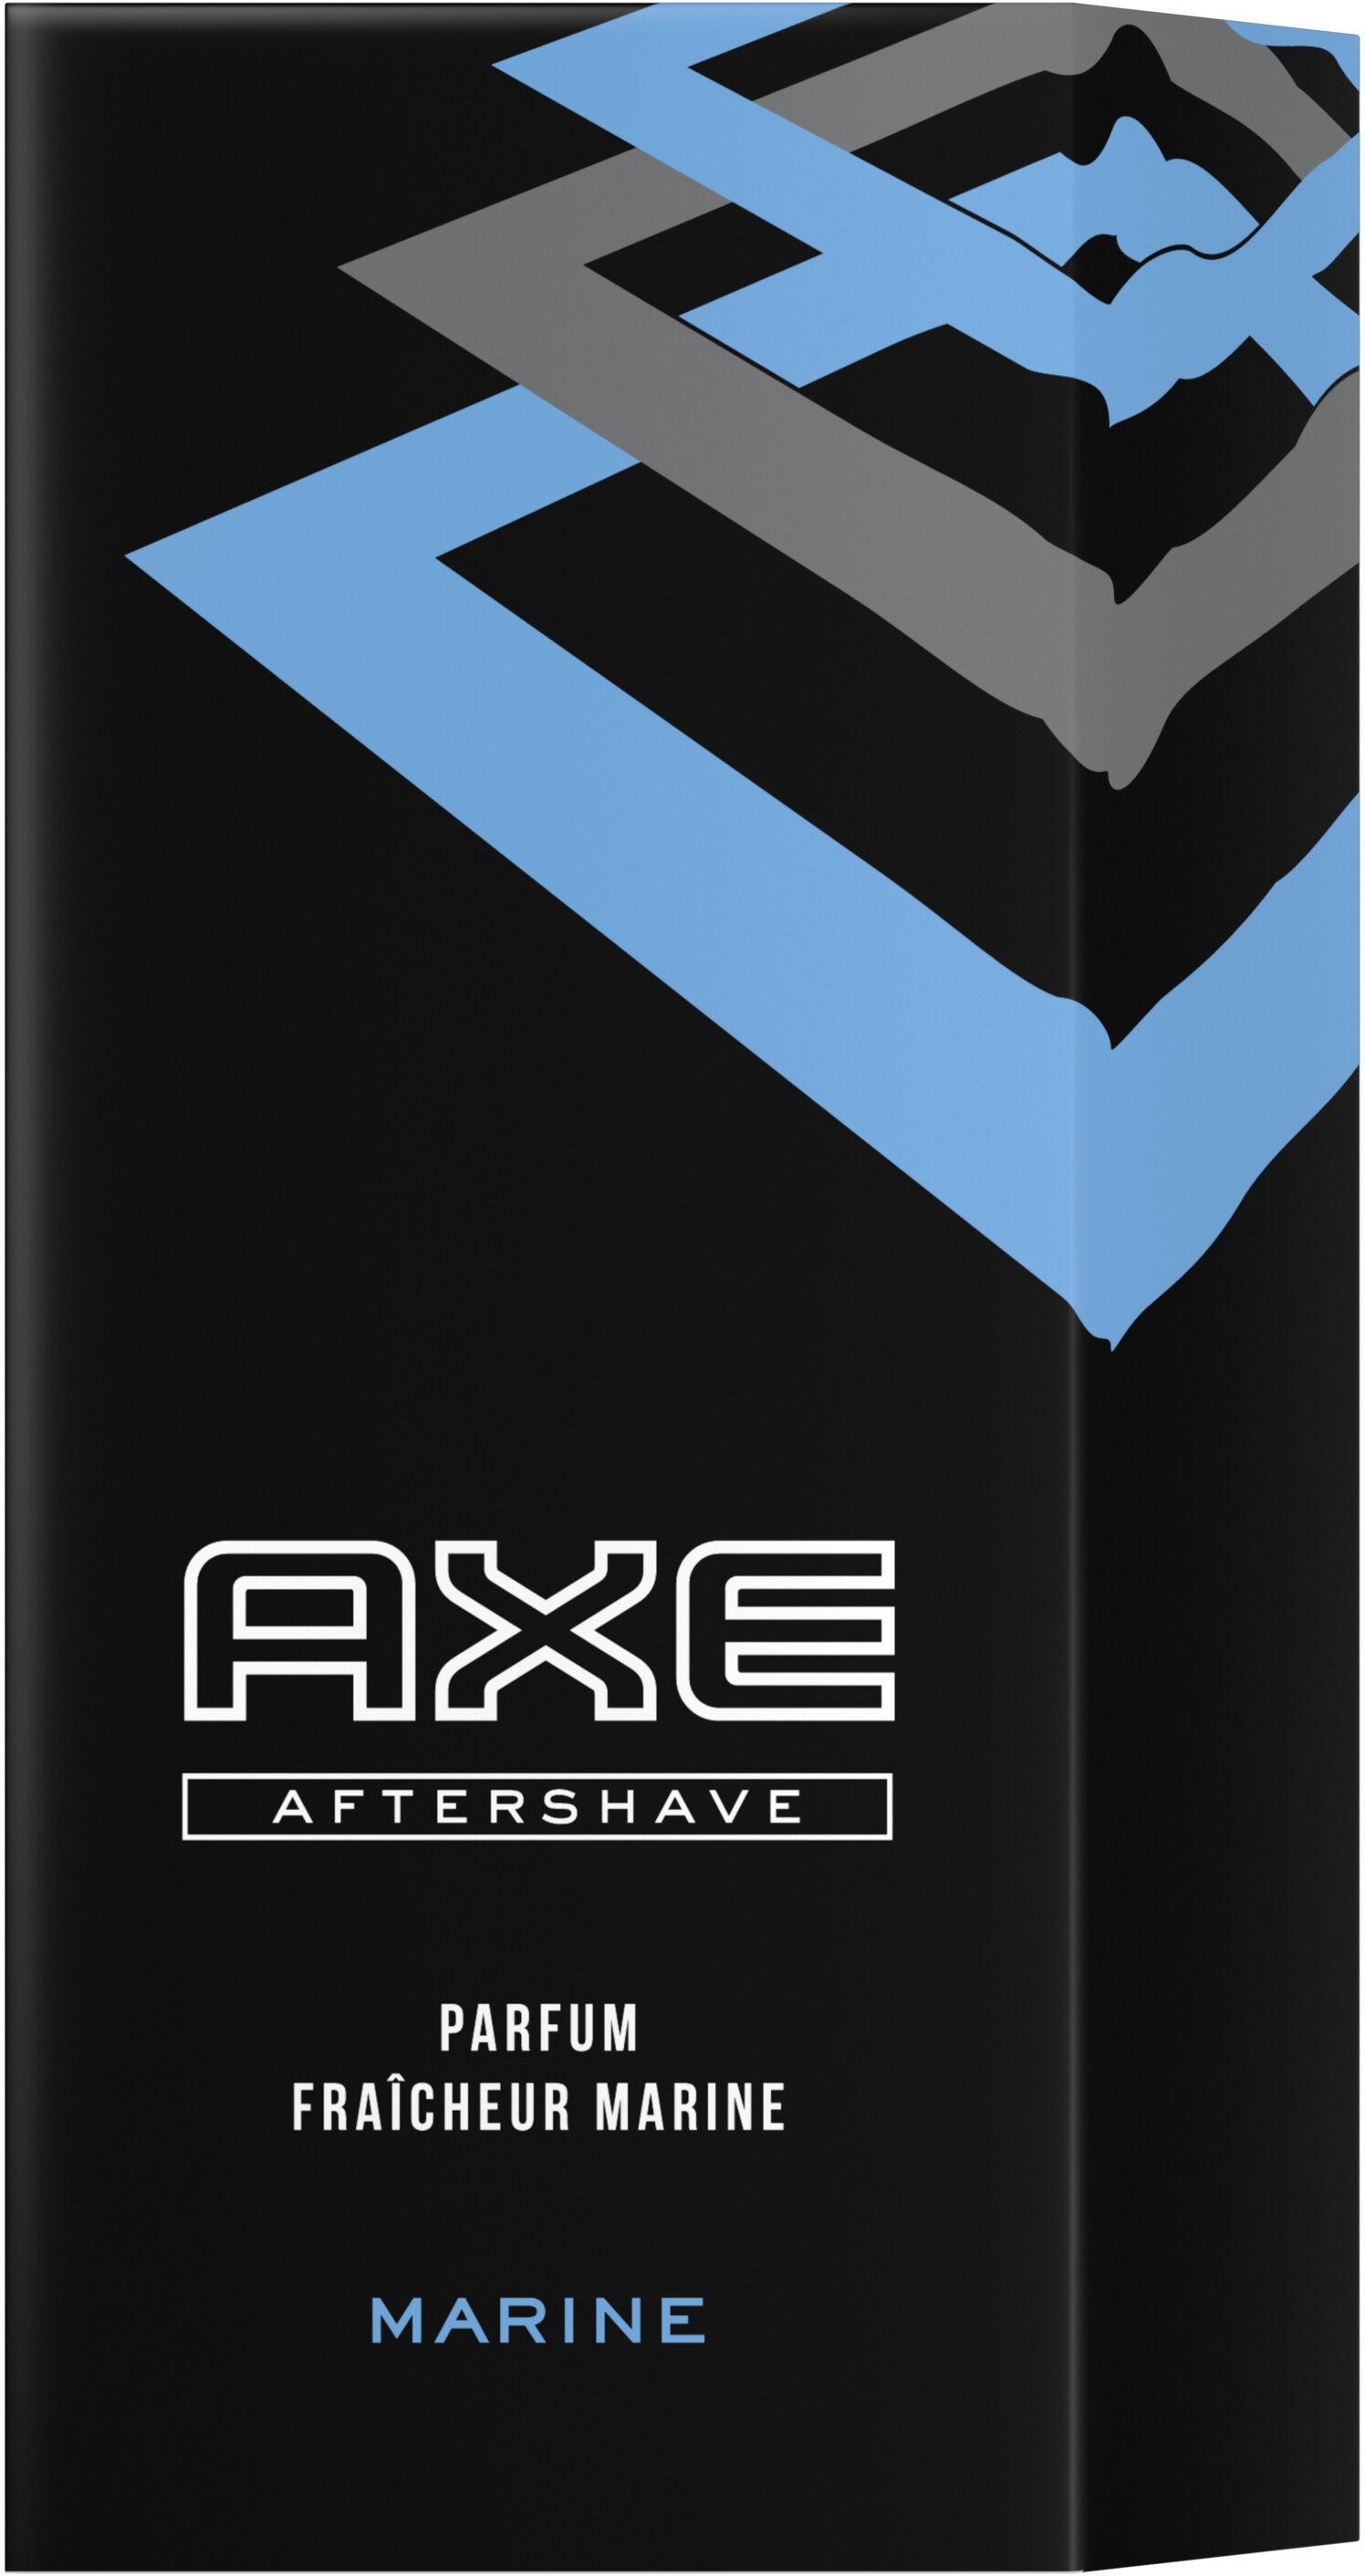 AXE Aftershave Fraîcheur Marine - Product - fr